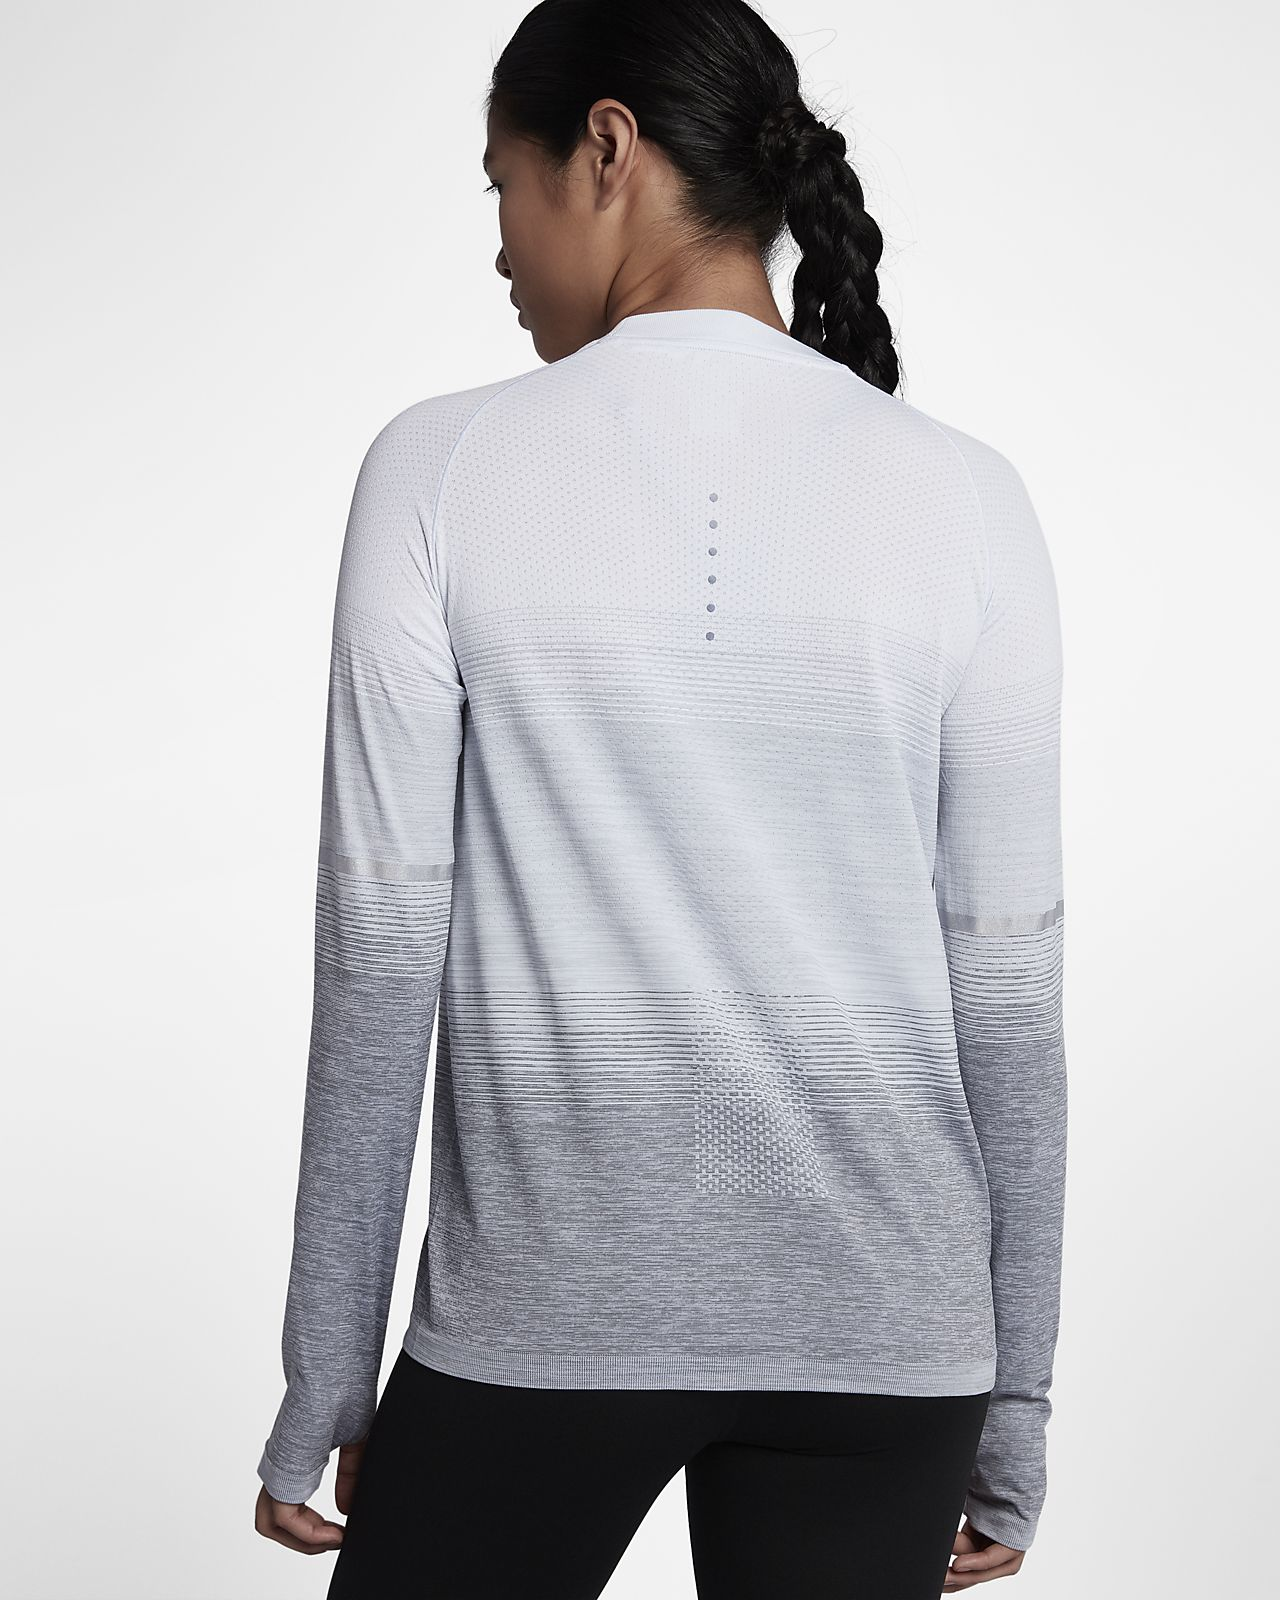 ... Nike Dri-FIT Knit Women's Long-Sleeve Running Top